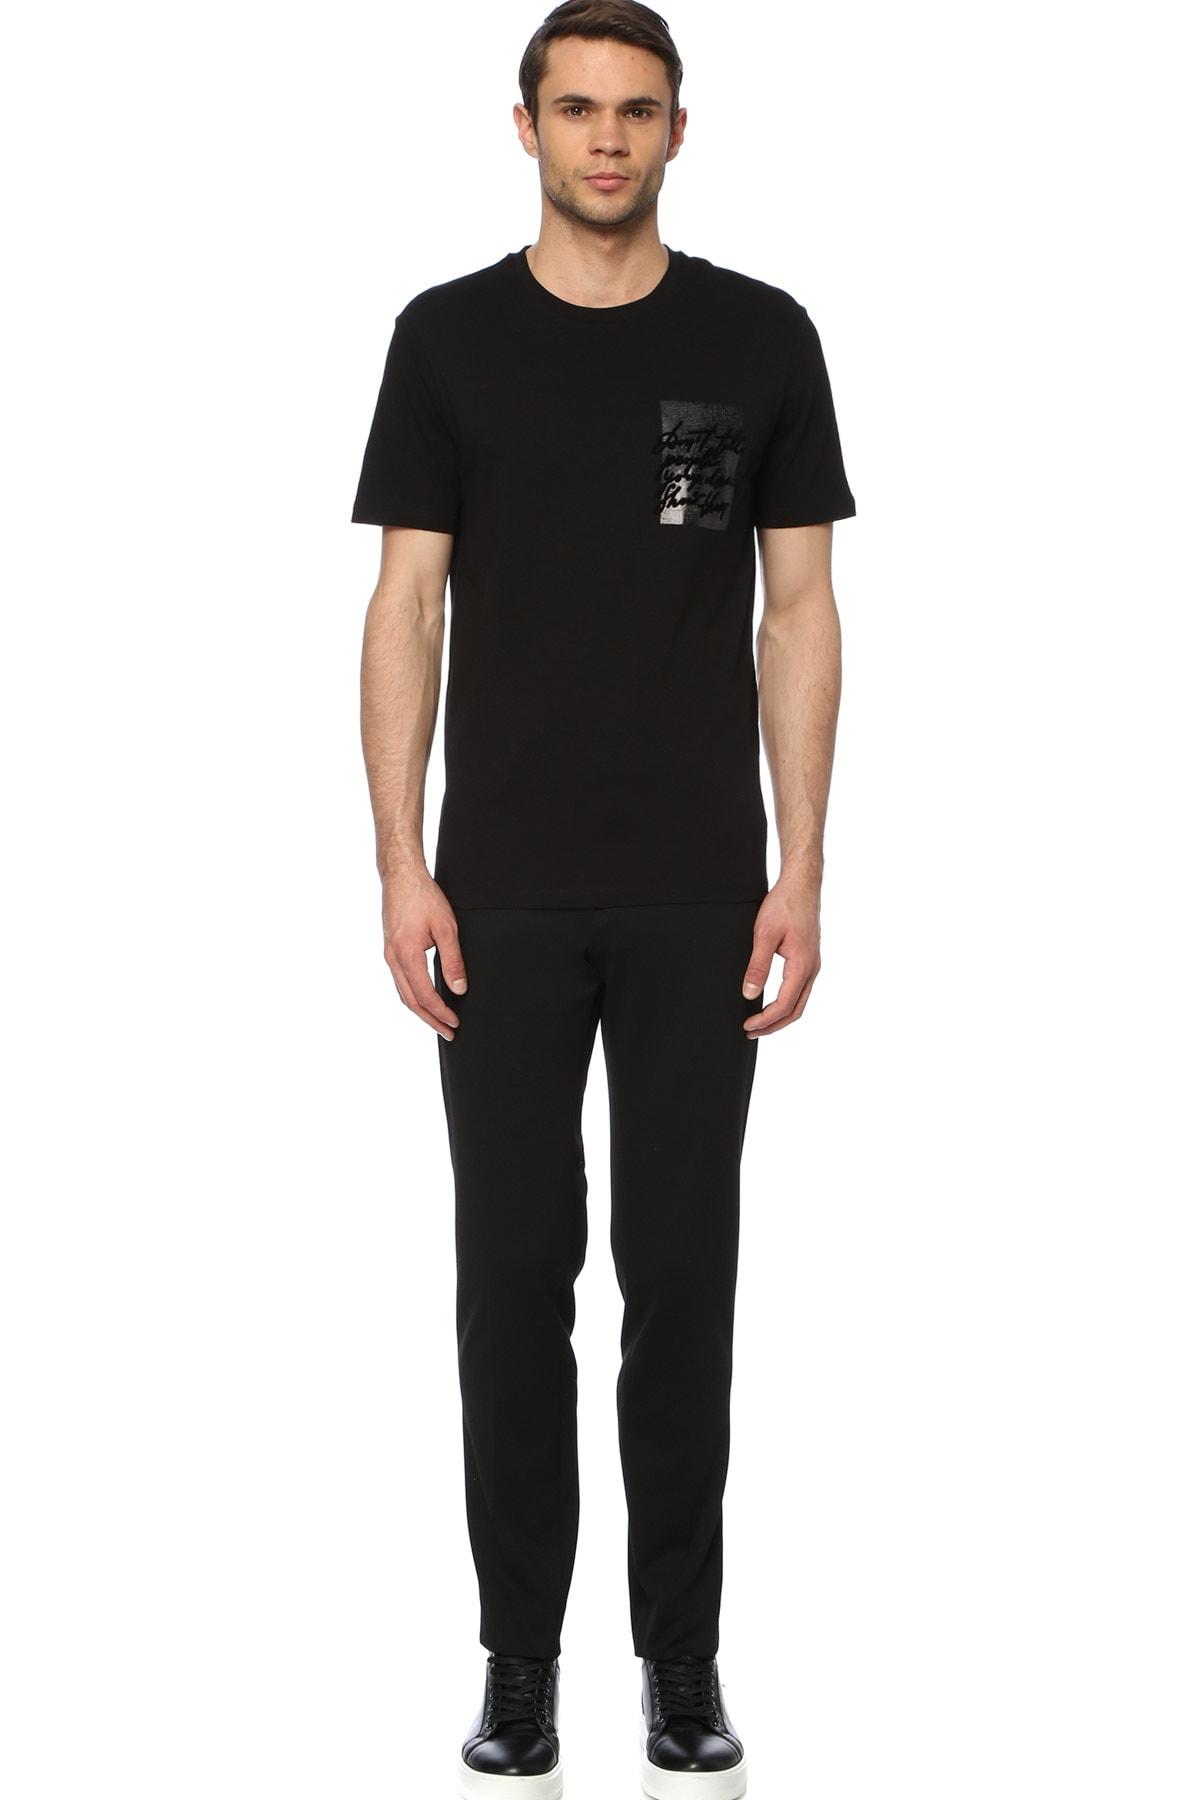 Network Erkek Slim Fit Siyah Tshirt 1074388